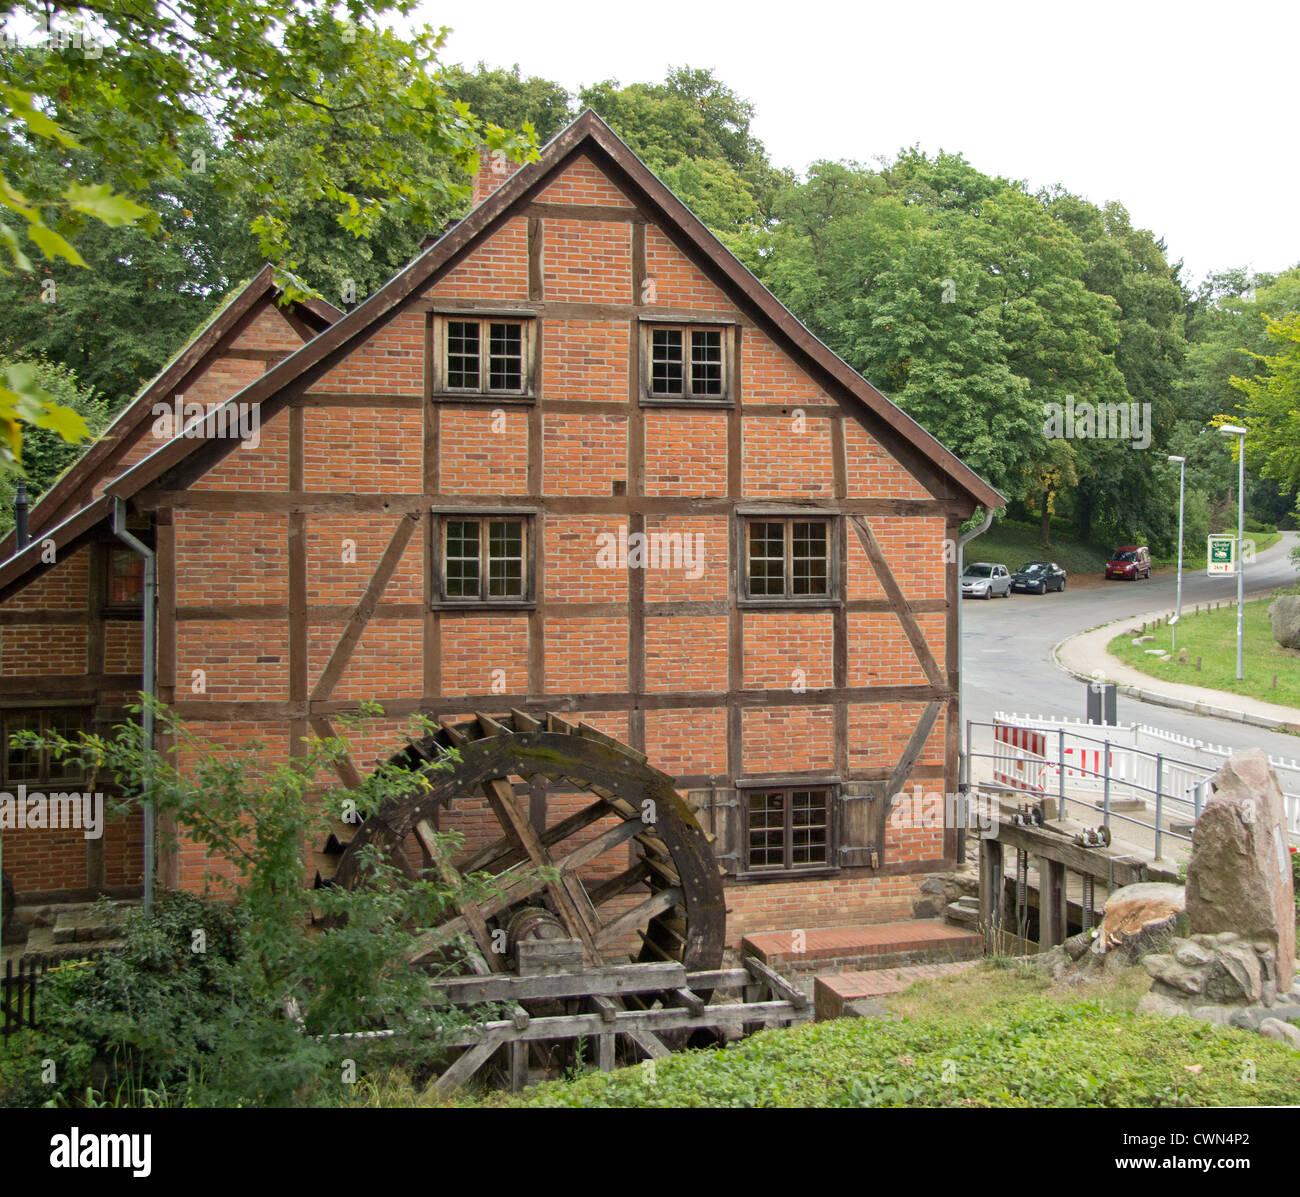 Schleifmuehle (water mill), Schwerin, Mecklenburg-West Pomerania, Germany - Stock Image